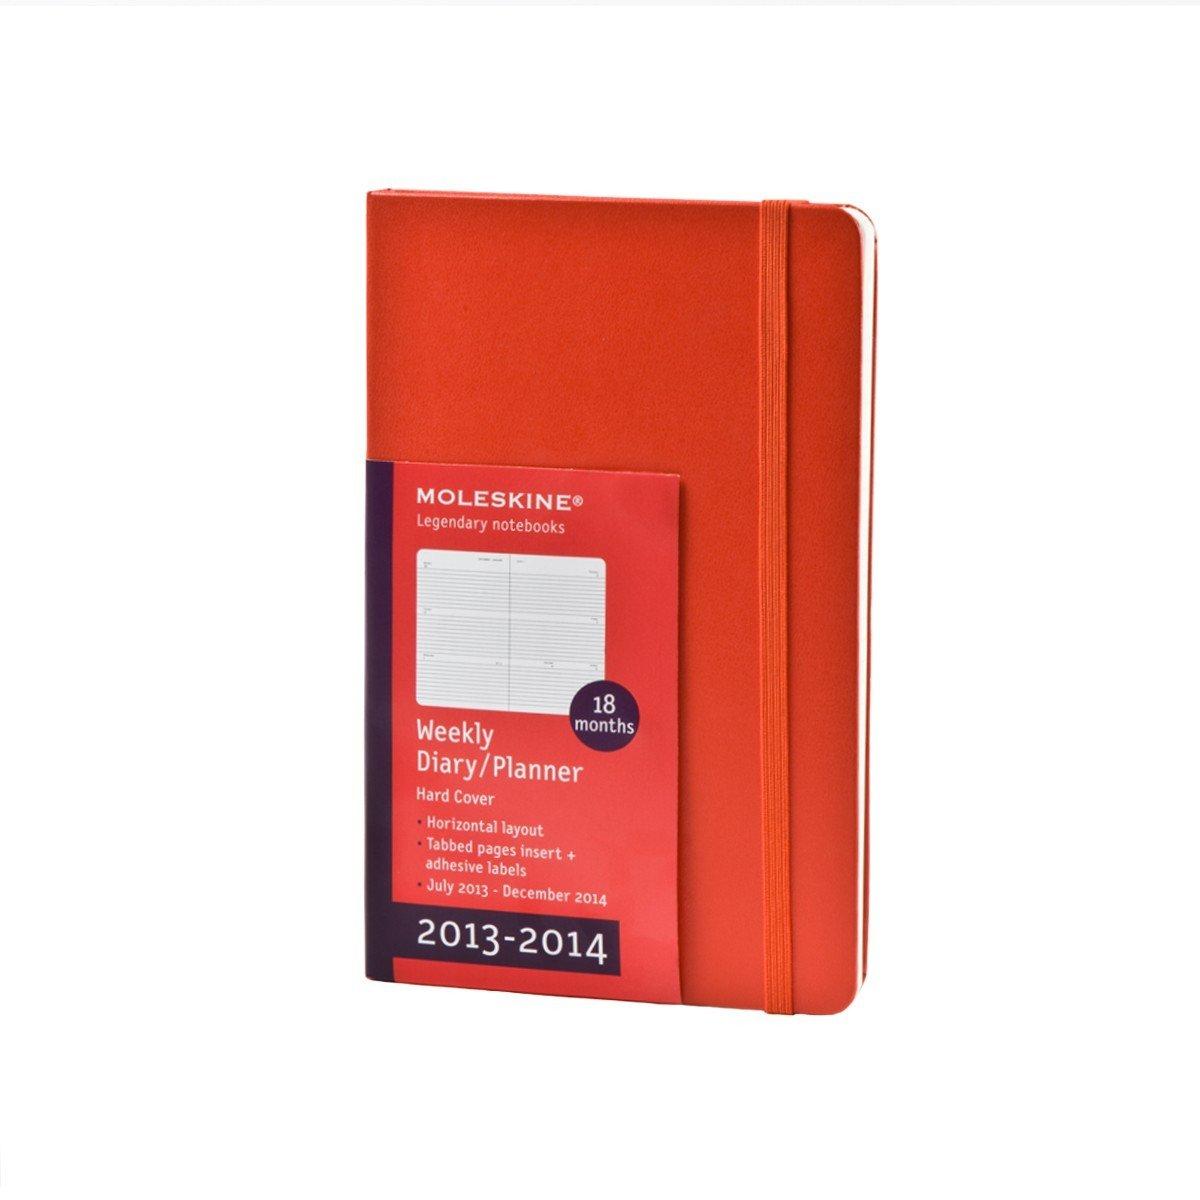 Moleskine 40159 - Agenda (18 Meses, 21 X 13 Cm), Color Rojo - agenda 2013-2014 roja large hard cover roja